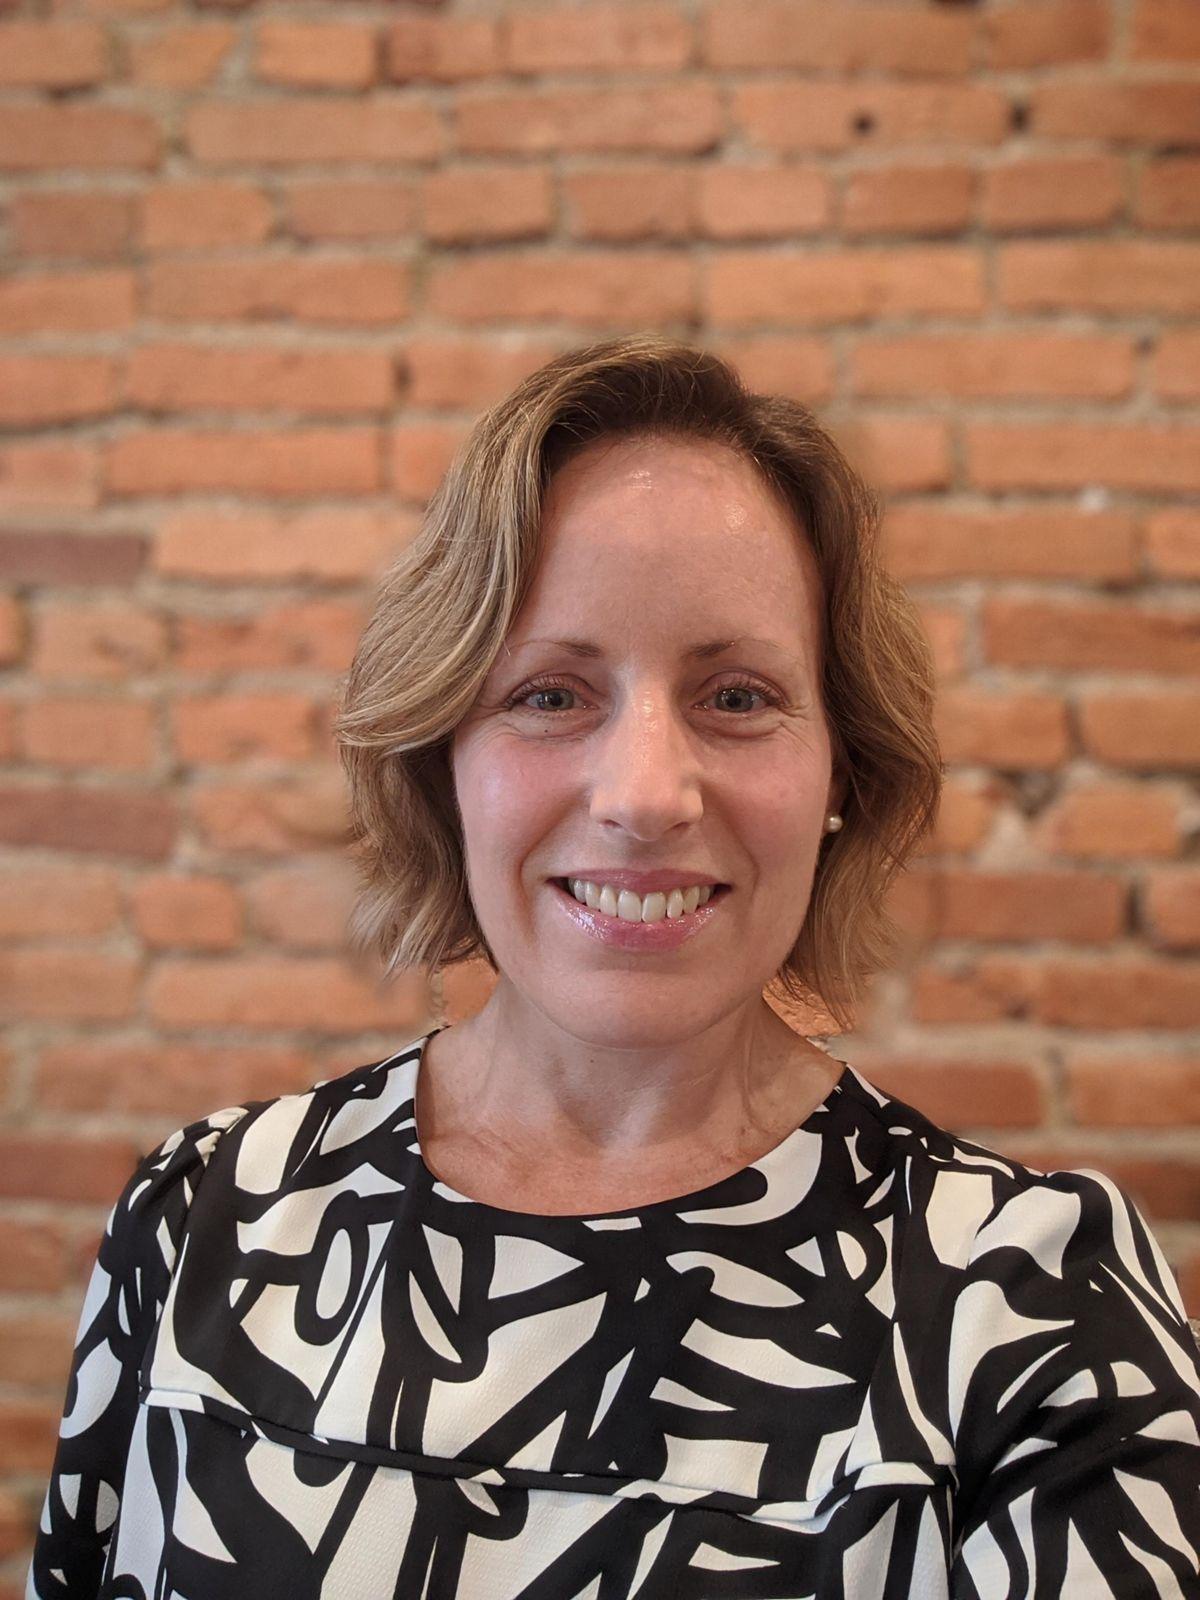 Dr. Elizabeth Barksdale Named LUNGevity Director of Regulatory Affairs, LUNGevity Foundation